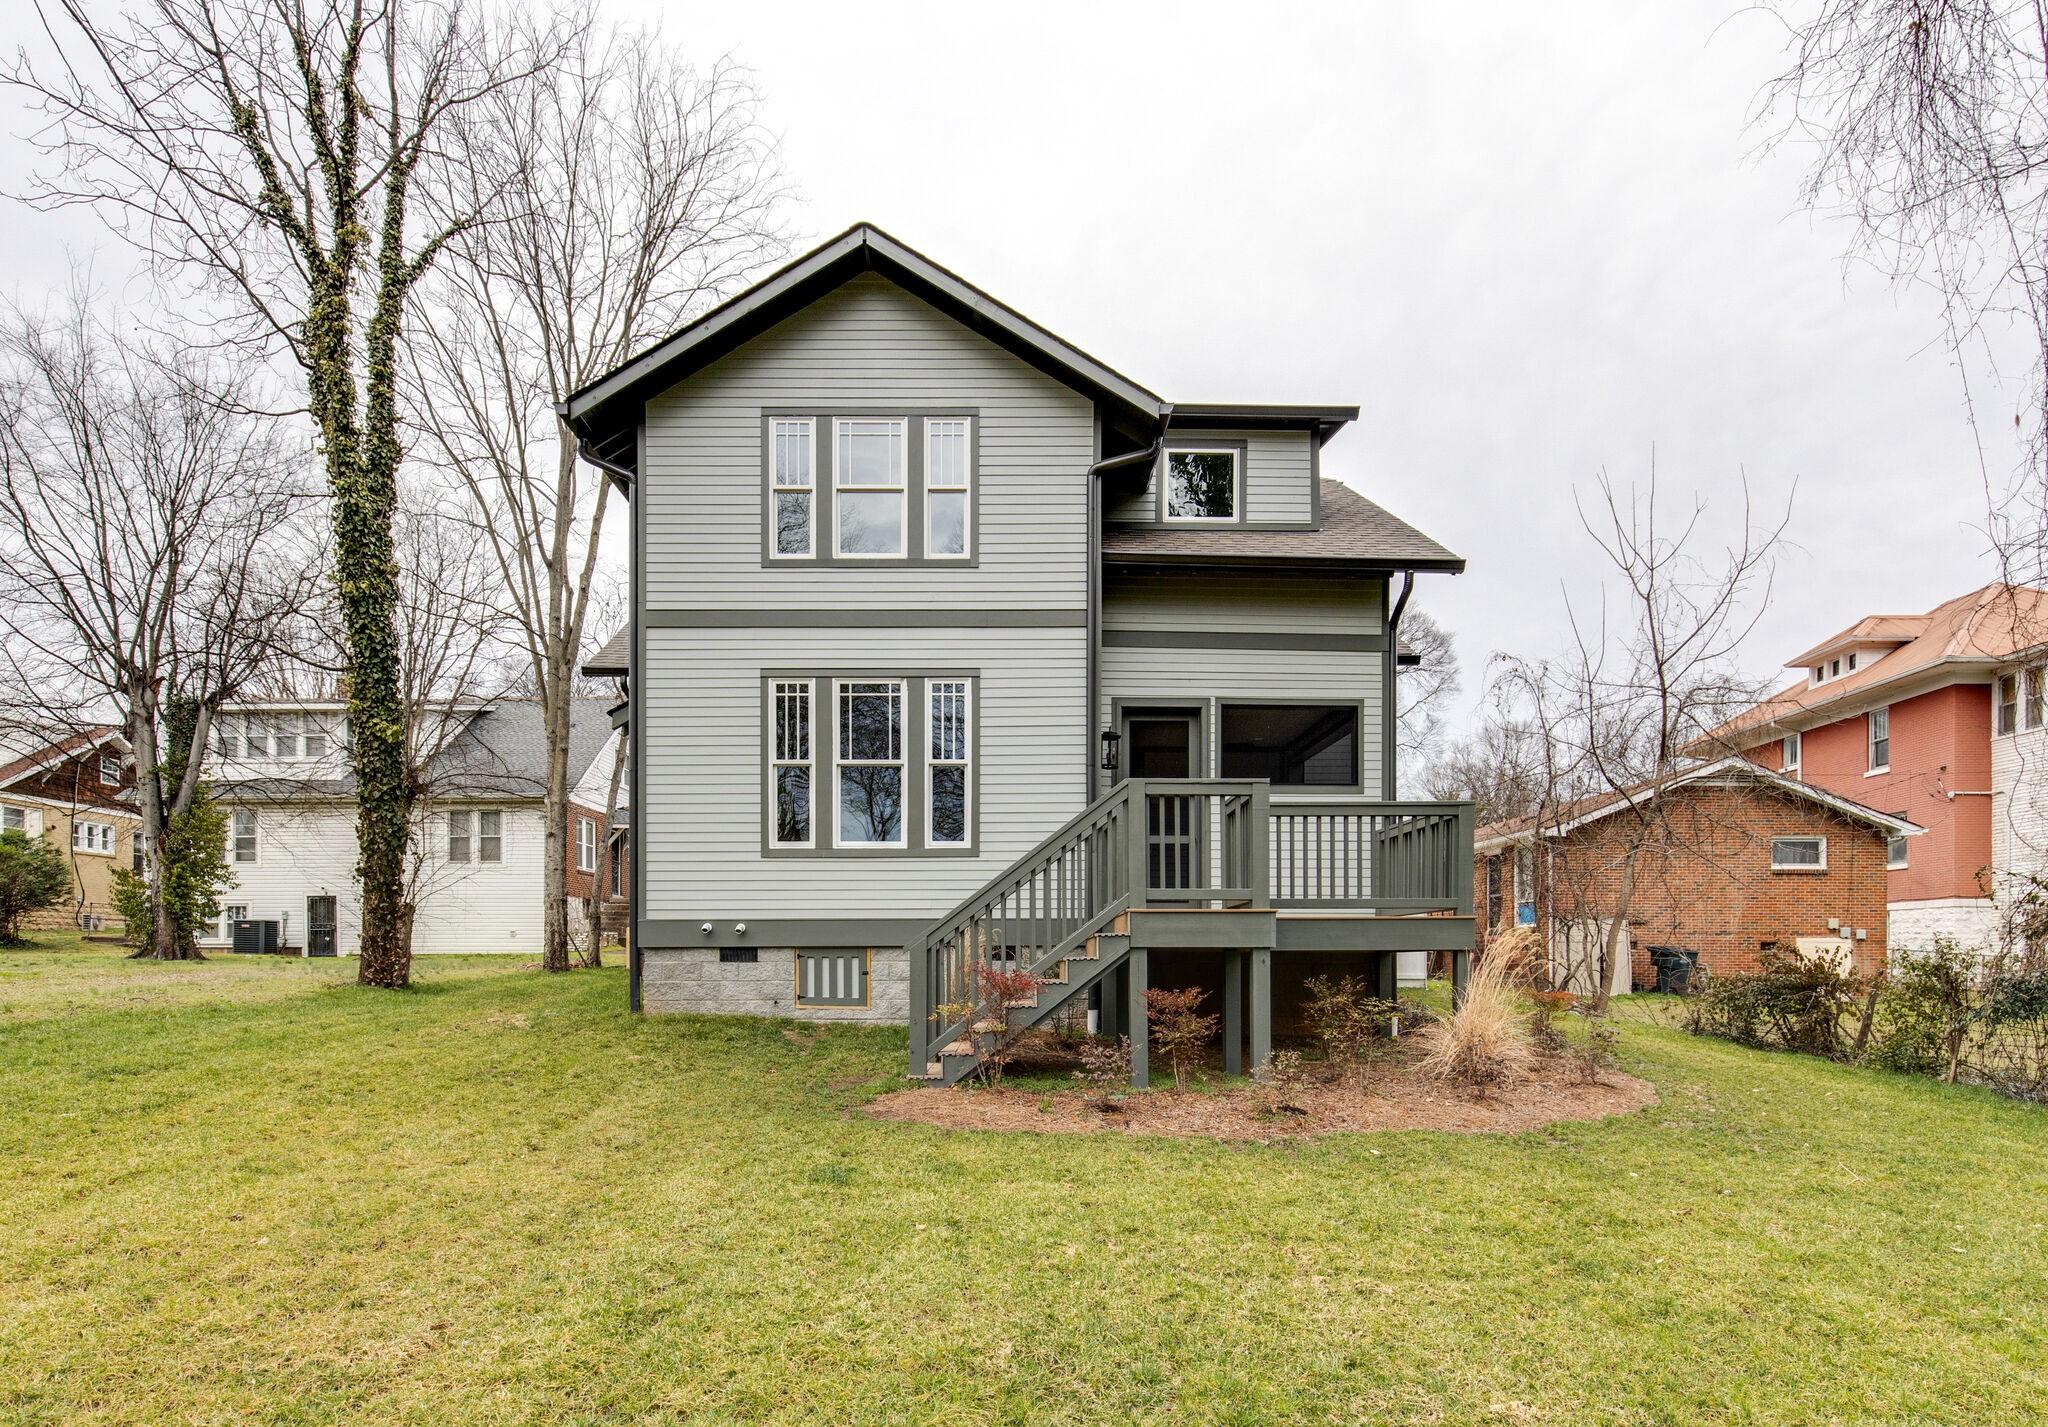 921B Benton Ave Property Photo - Nashville, TN real estate listing